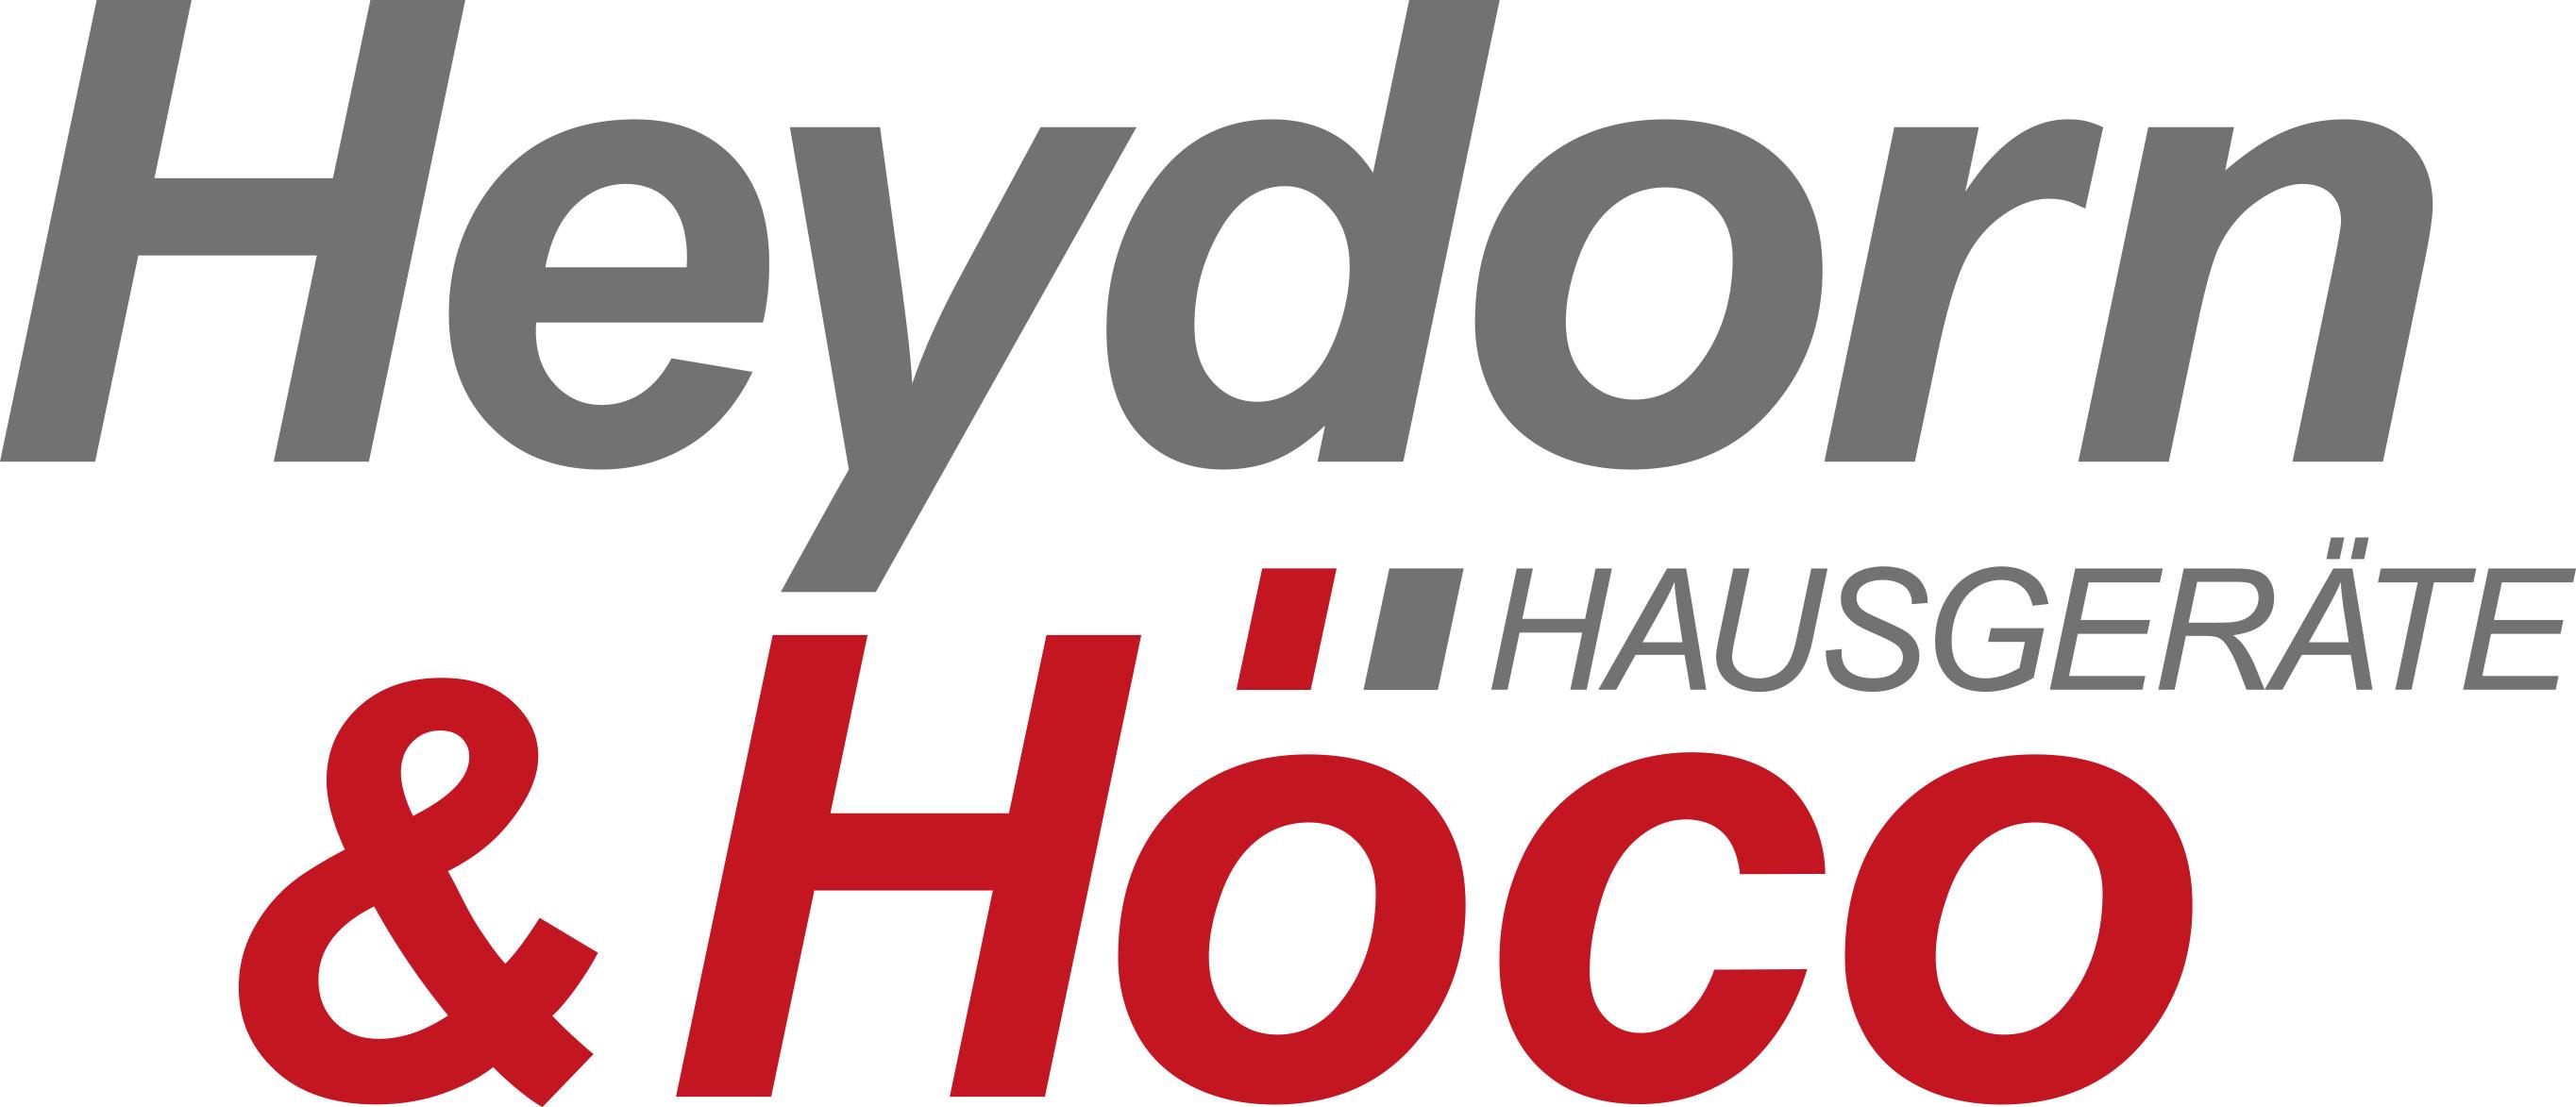 Heydorn&Hoeco